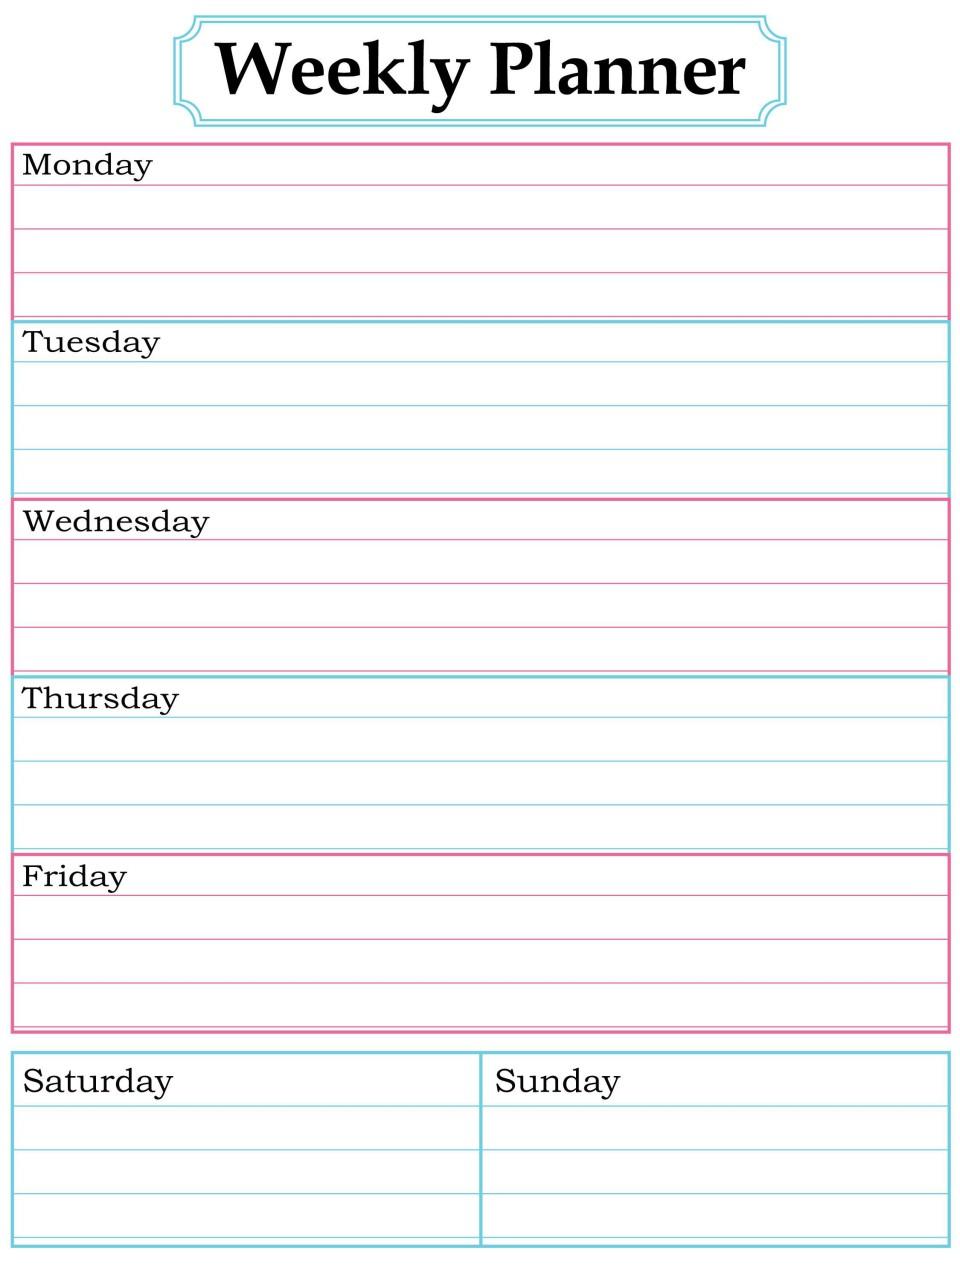 003 Surprising Printable Weekly Planner Template Cute Inspiration  Free Calendar960